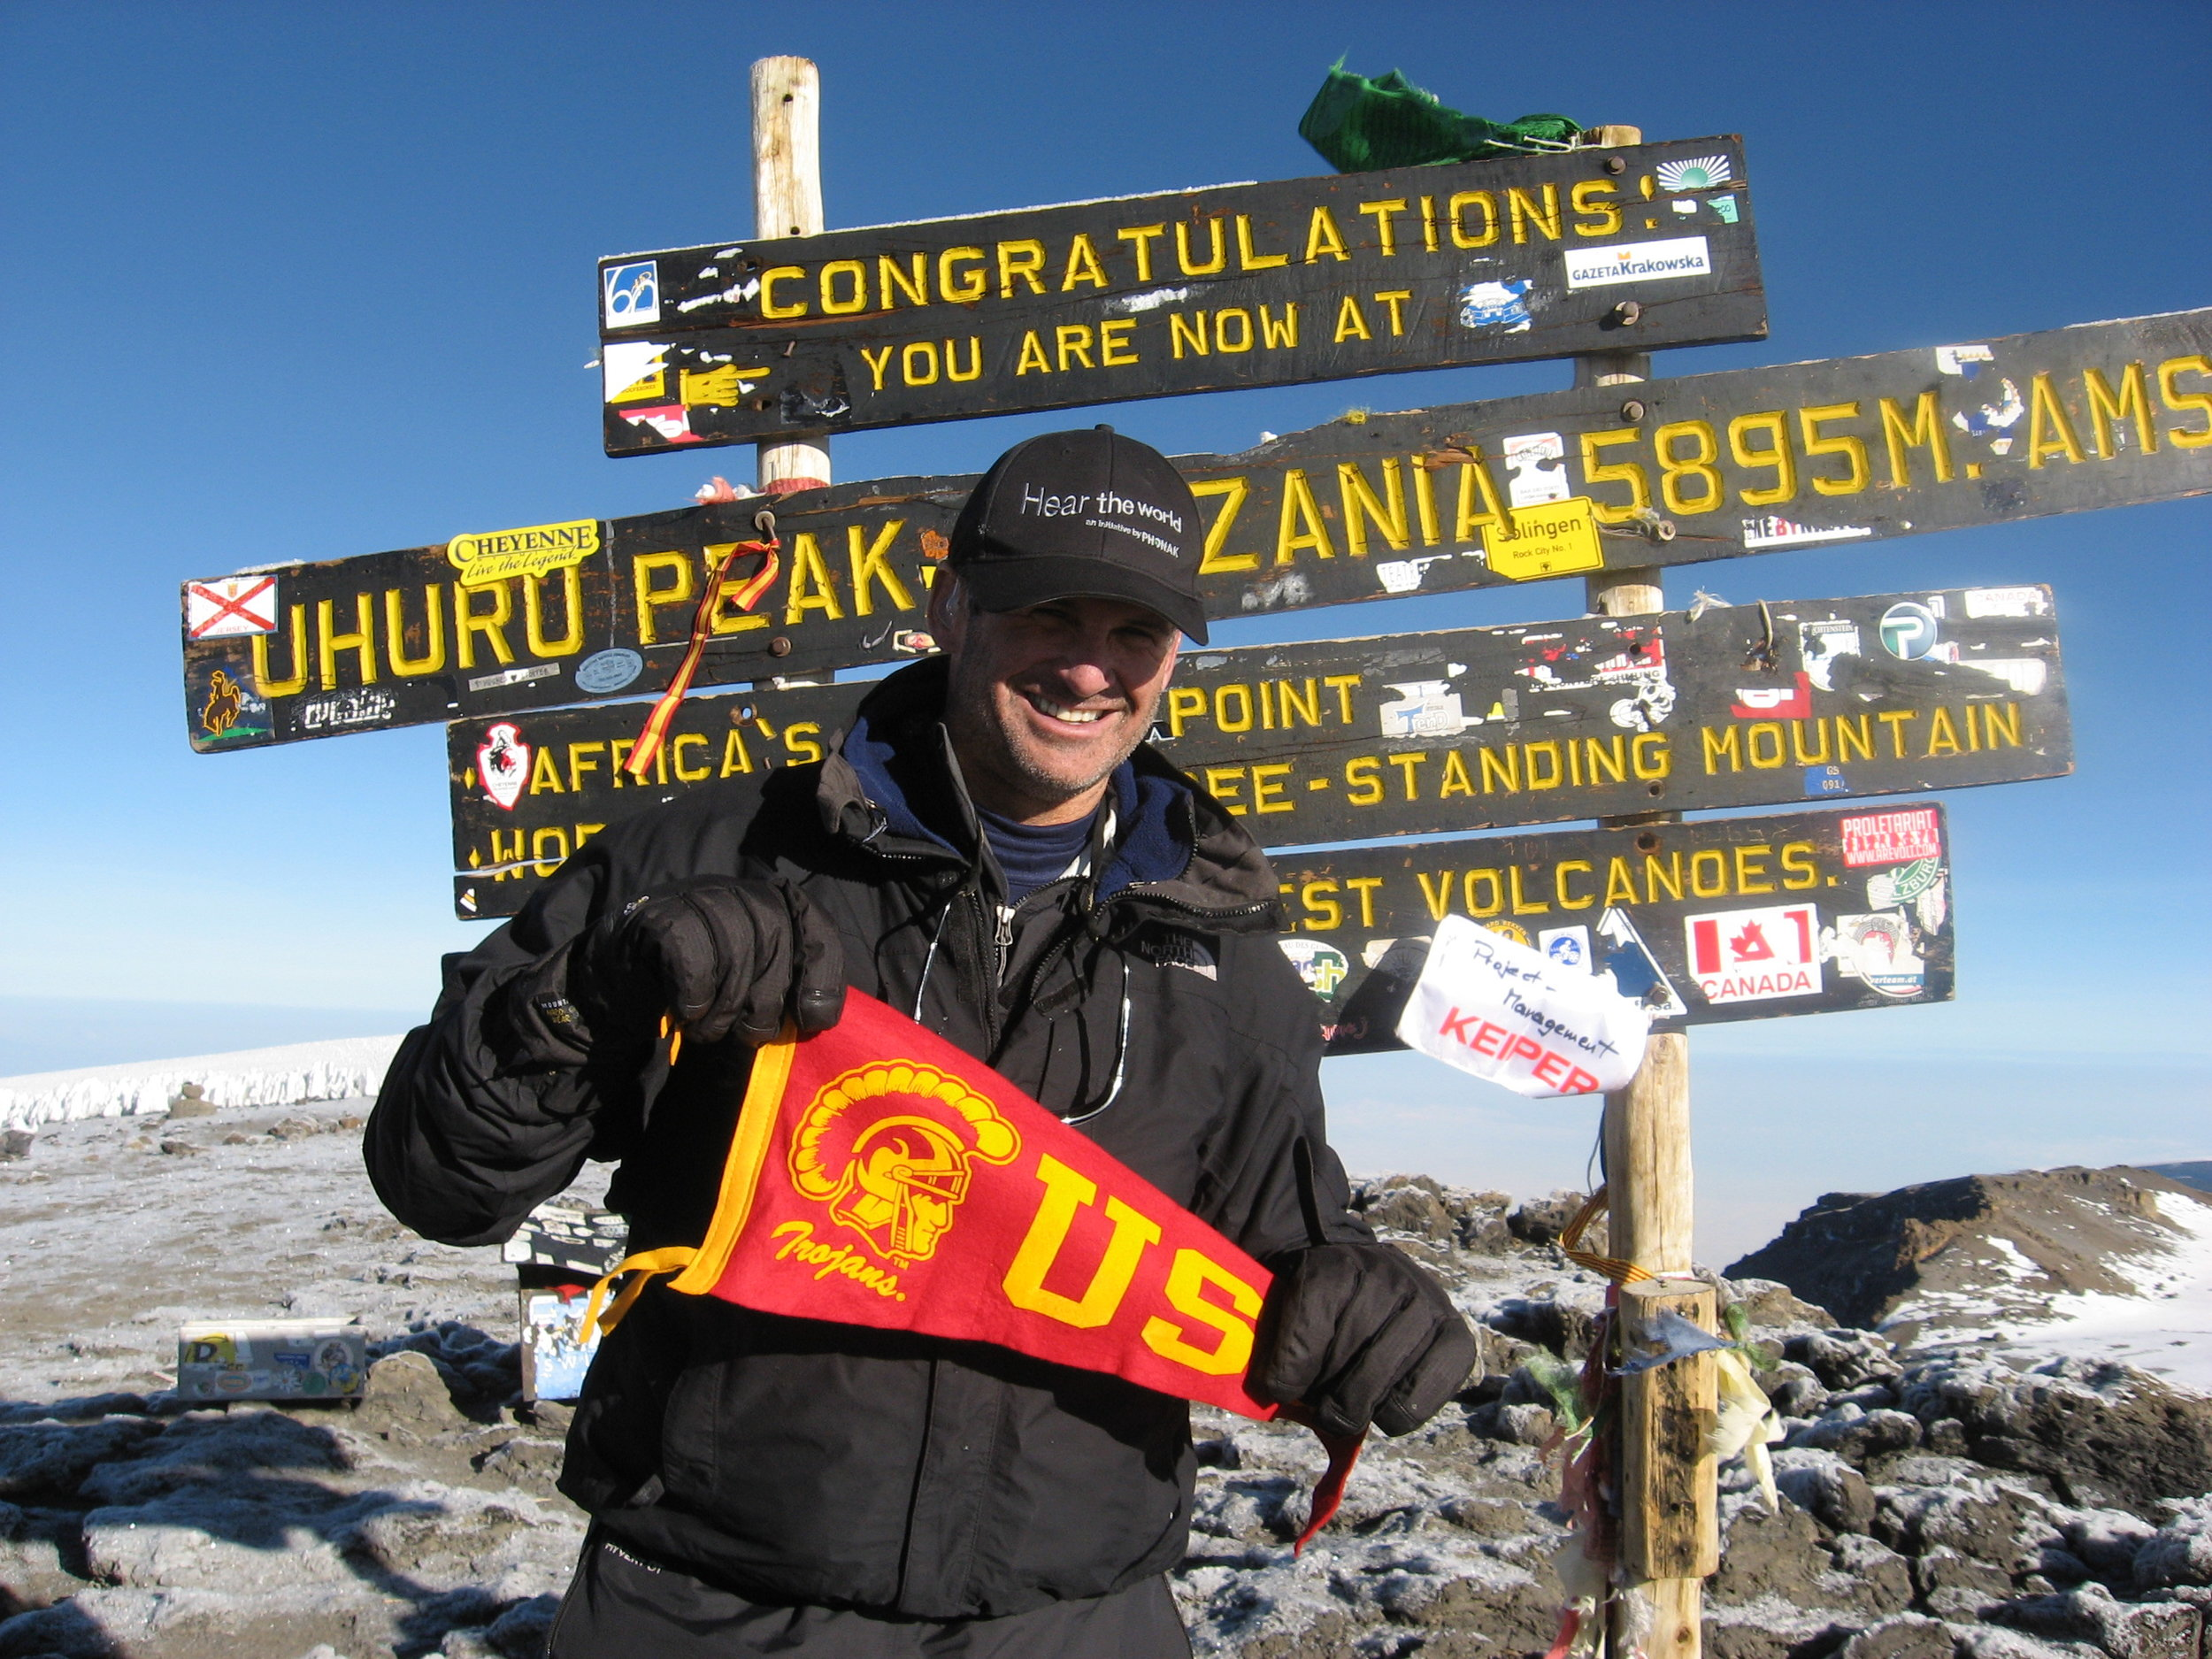 deaf-blind adventurer, advocate and inspiring storyteller - MOUNT KILIMANJARO SUMMIT 19, 400 FEET